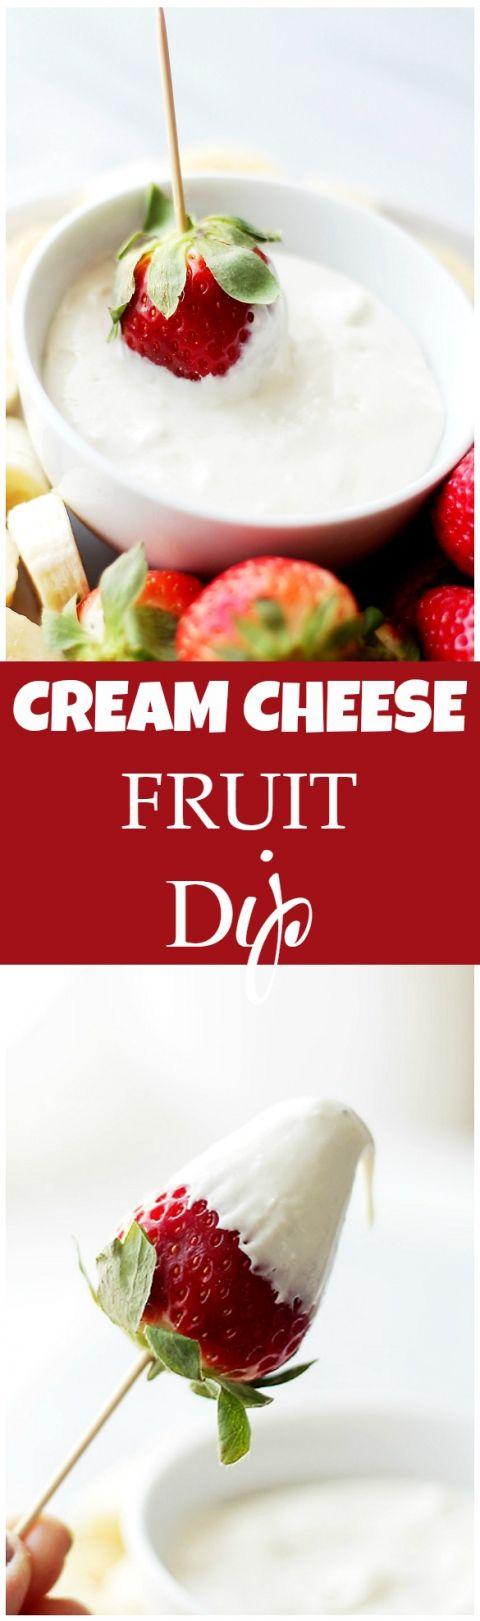 Cream Cheese Fruit Dip - Delicious, lightened-up creamy fruit dip made with cream cheese and plain yogurt. Simple, yet SO GOOD!